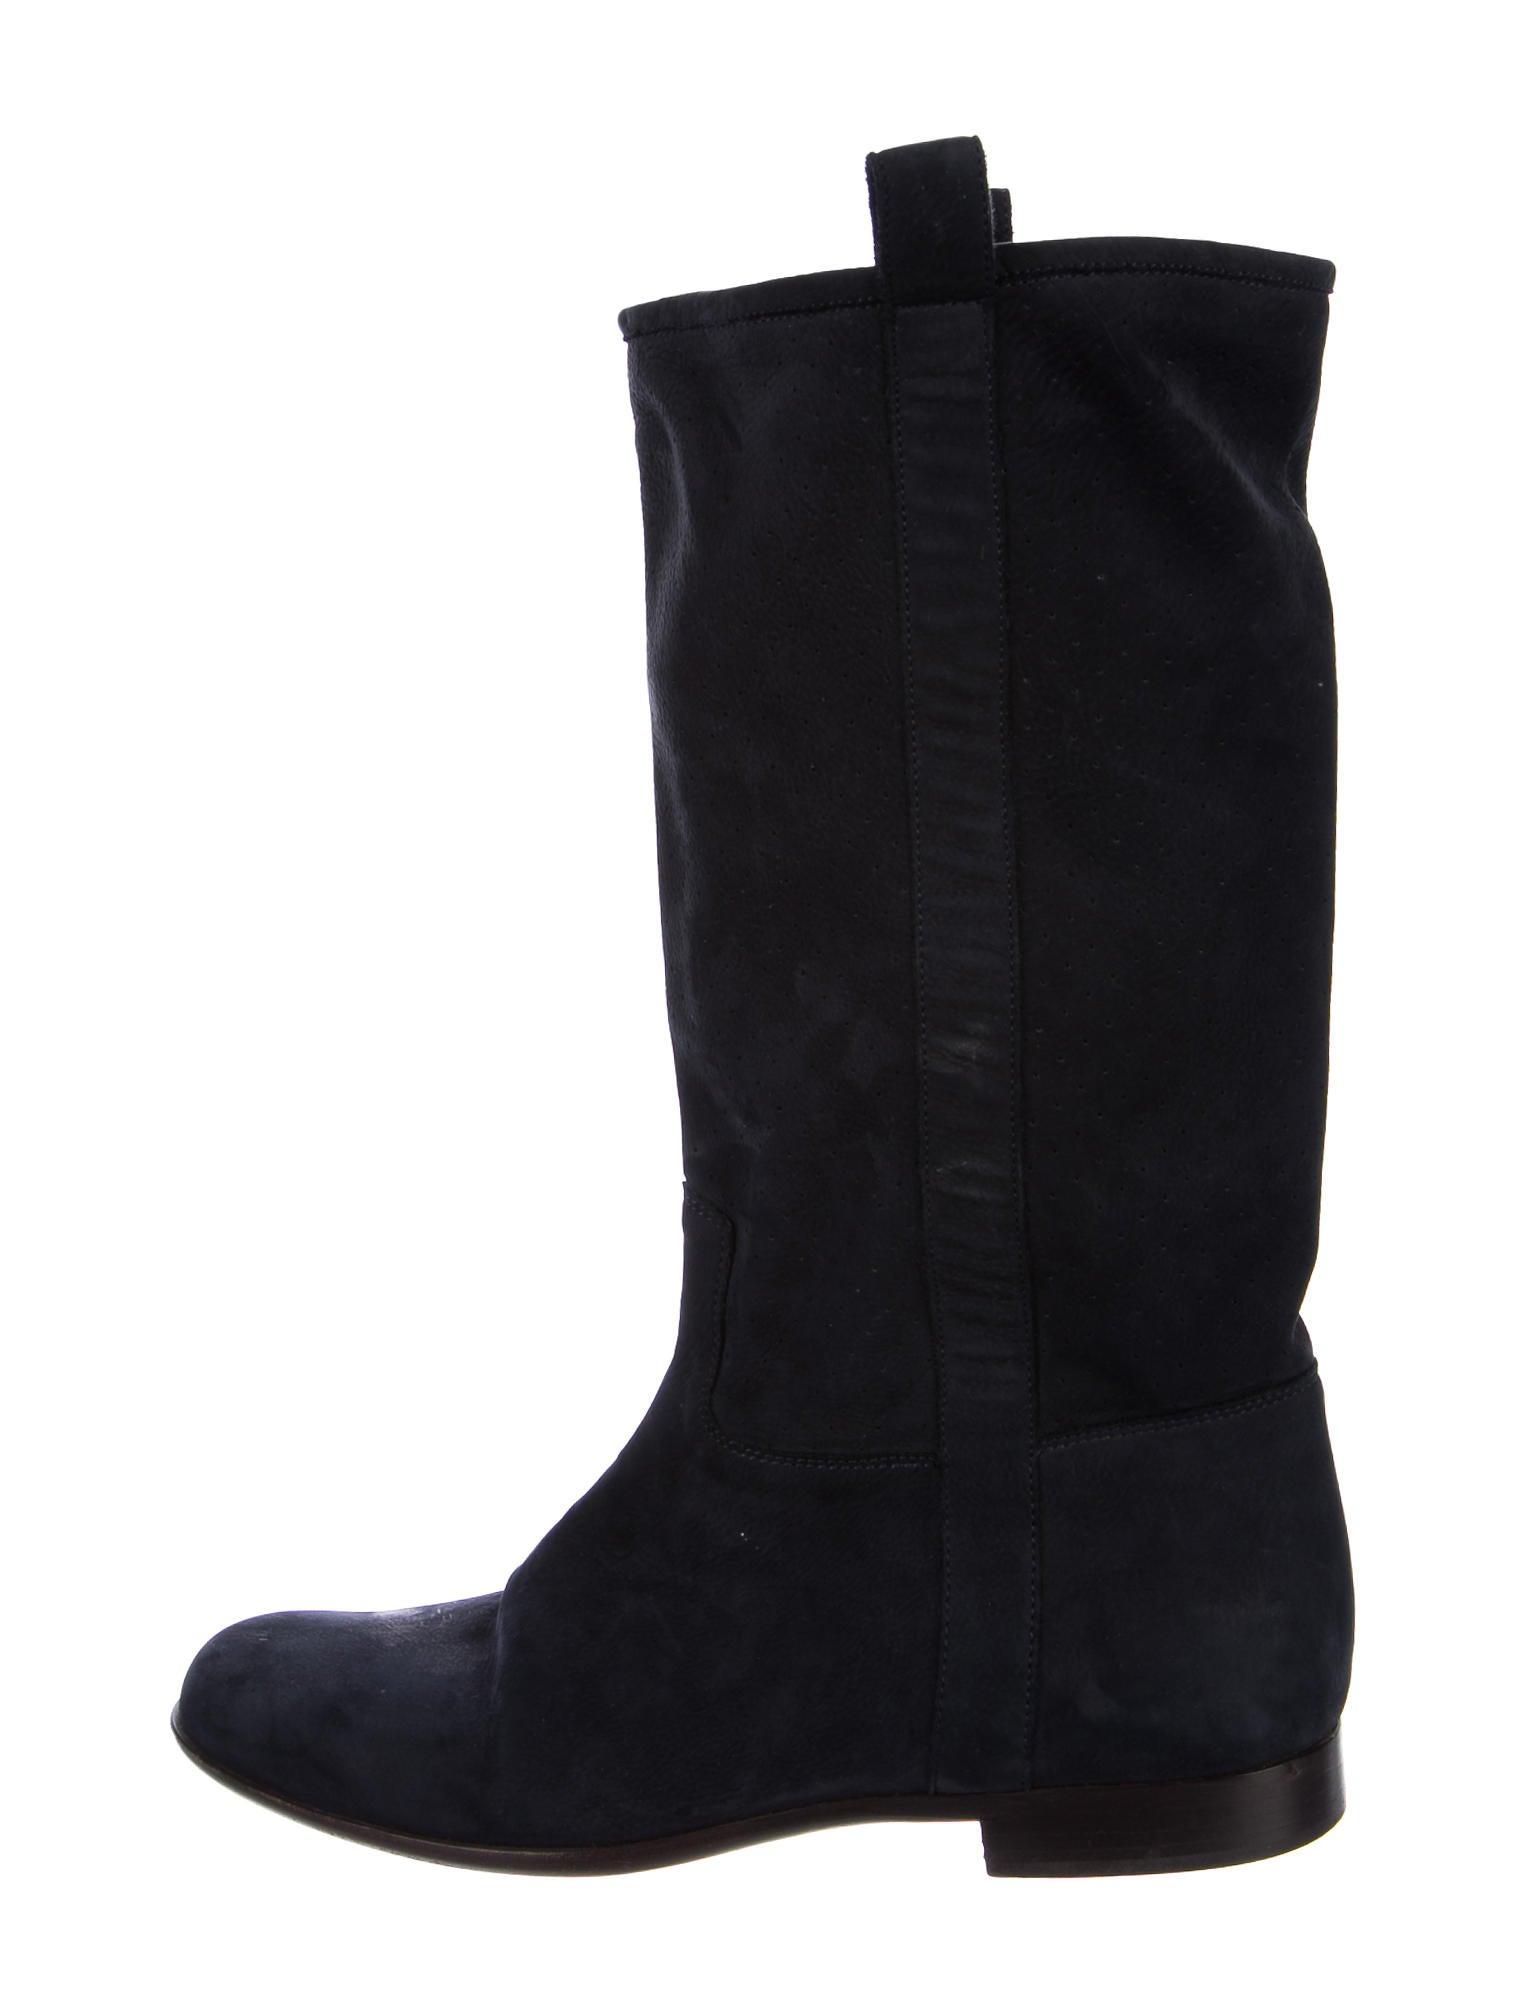 sale 2015 original Sartore Suede Mid-Calf Boots cheap sale view buy cheap view eloe6S